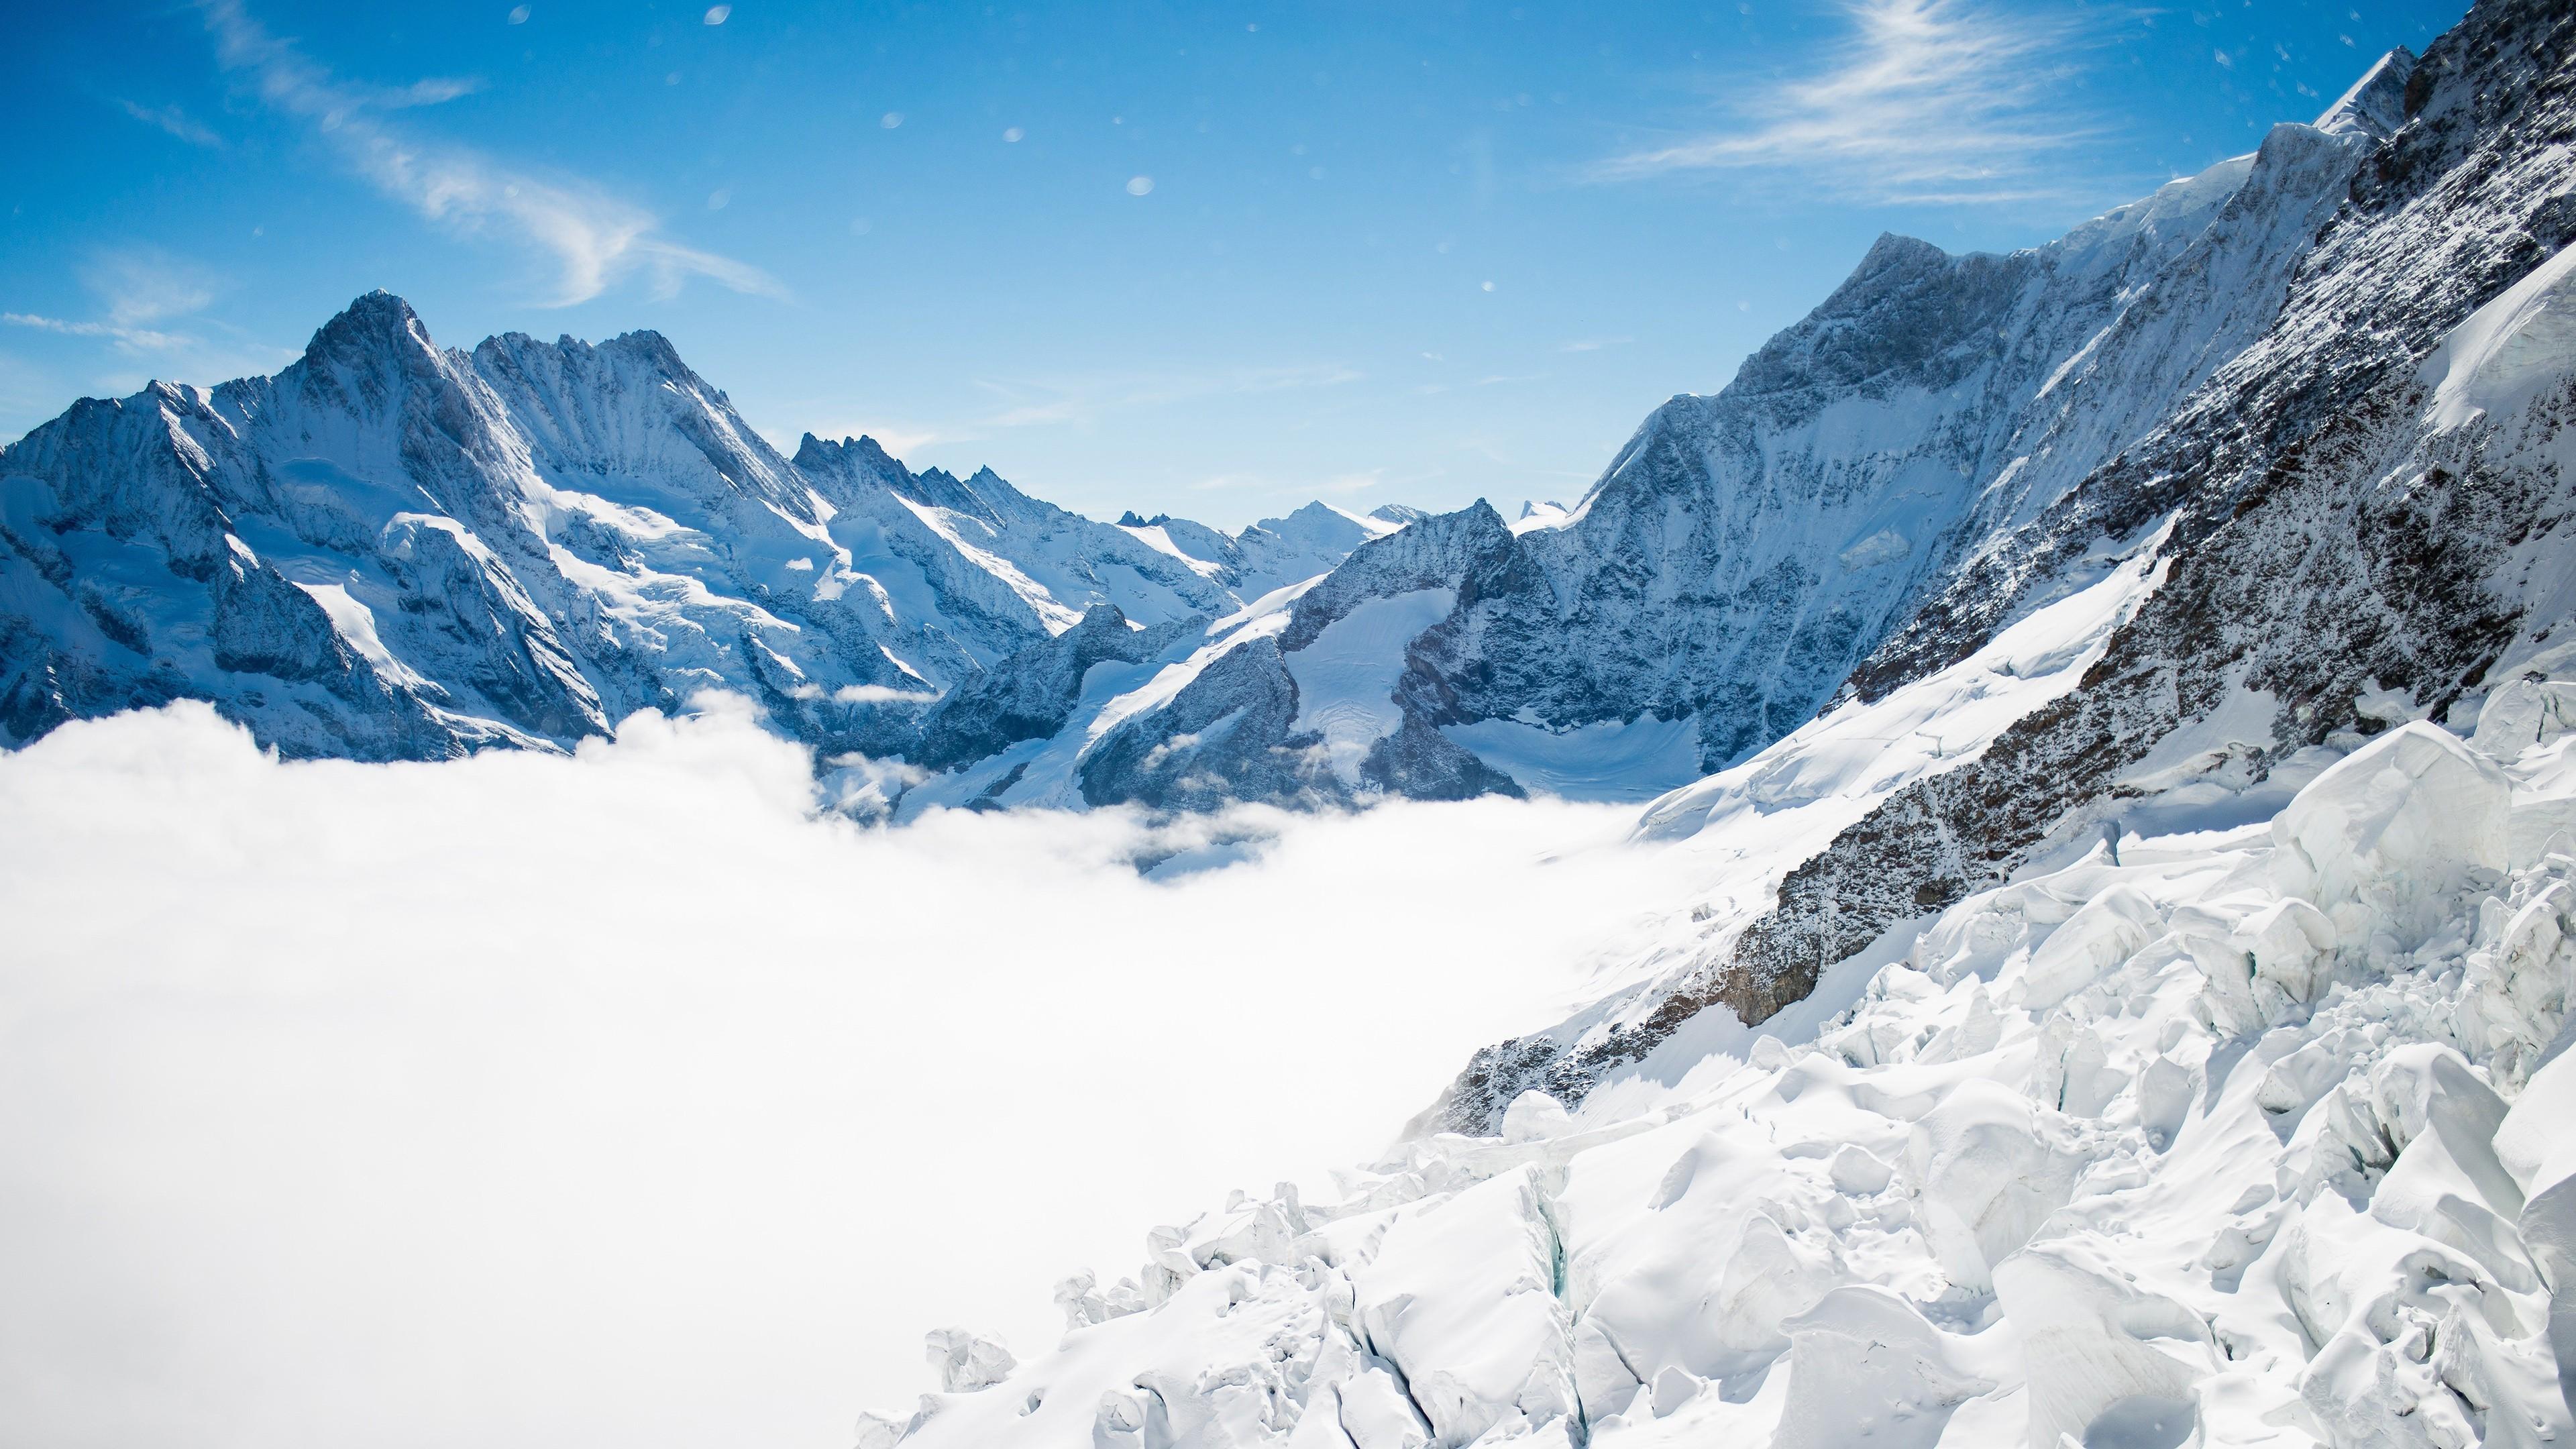 Green Wallpaper Iphone X Bernese Alps Winter Mountains 4k Wallpapers Hd